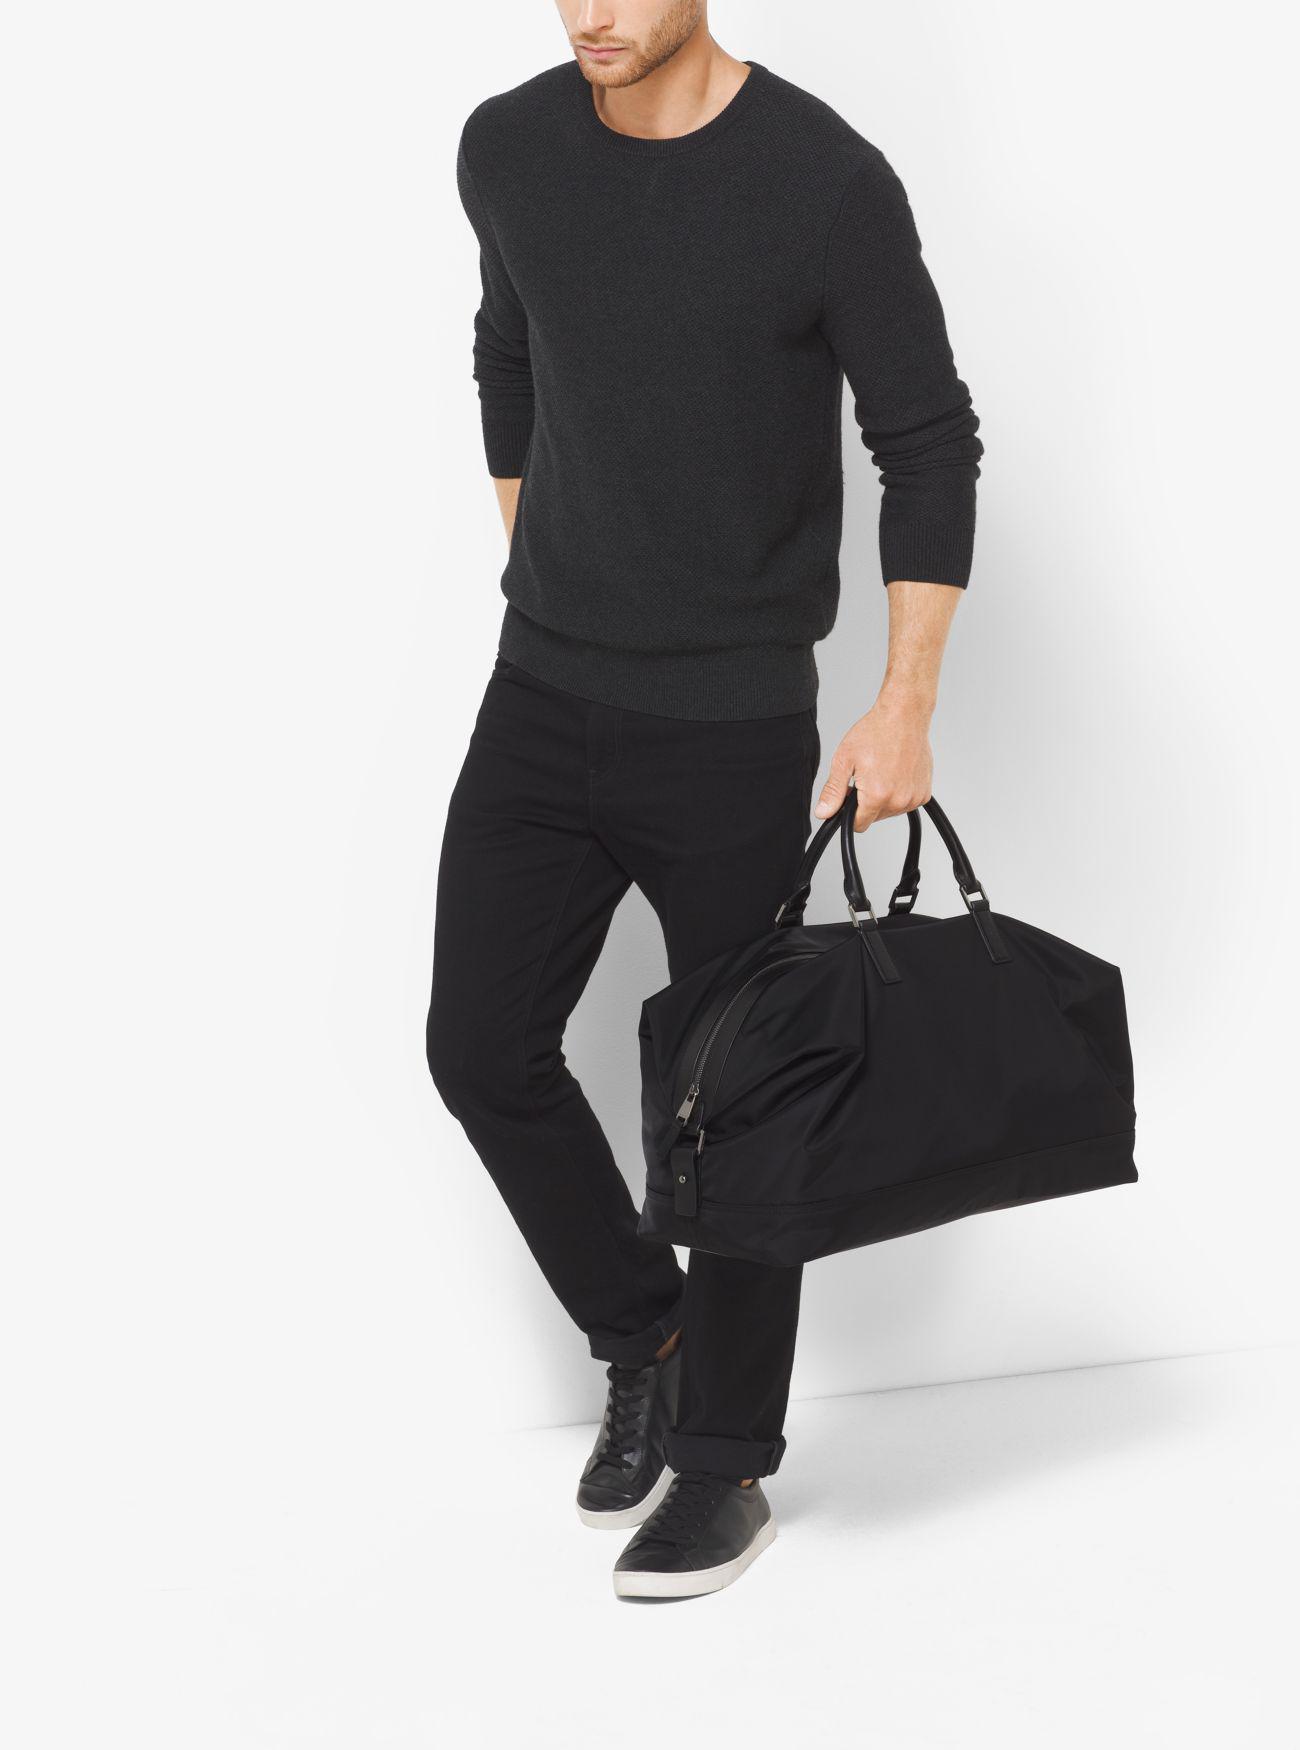 482d7f23e5d8 Lyst - Michael Kors Kent Large Nylon Duffel in Black for Men